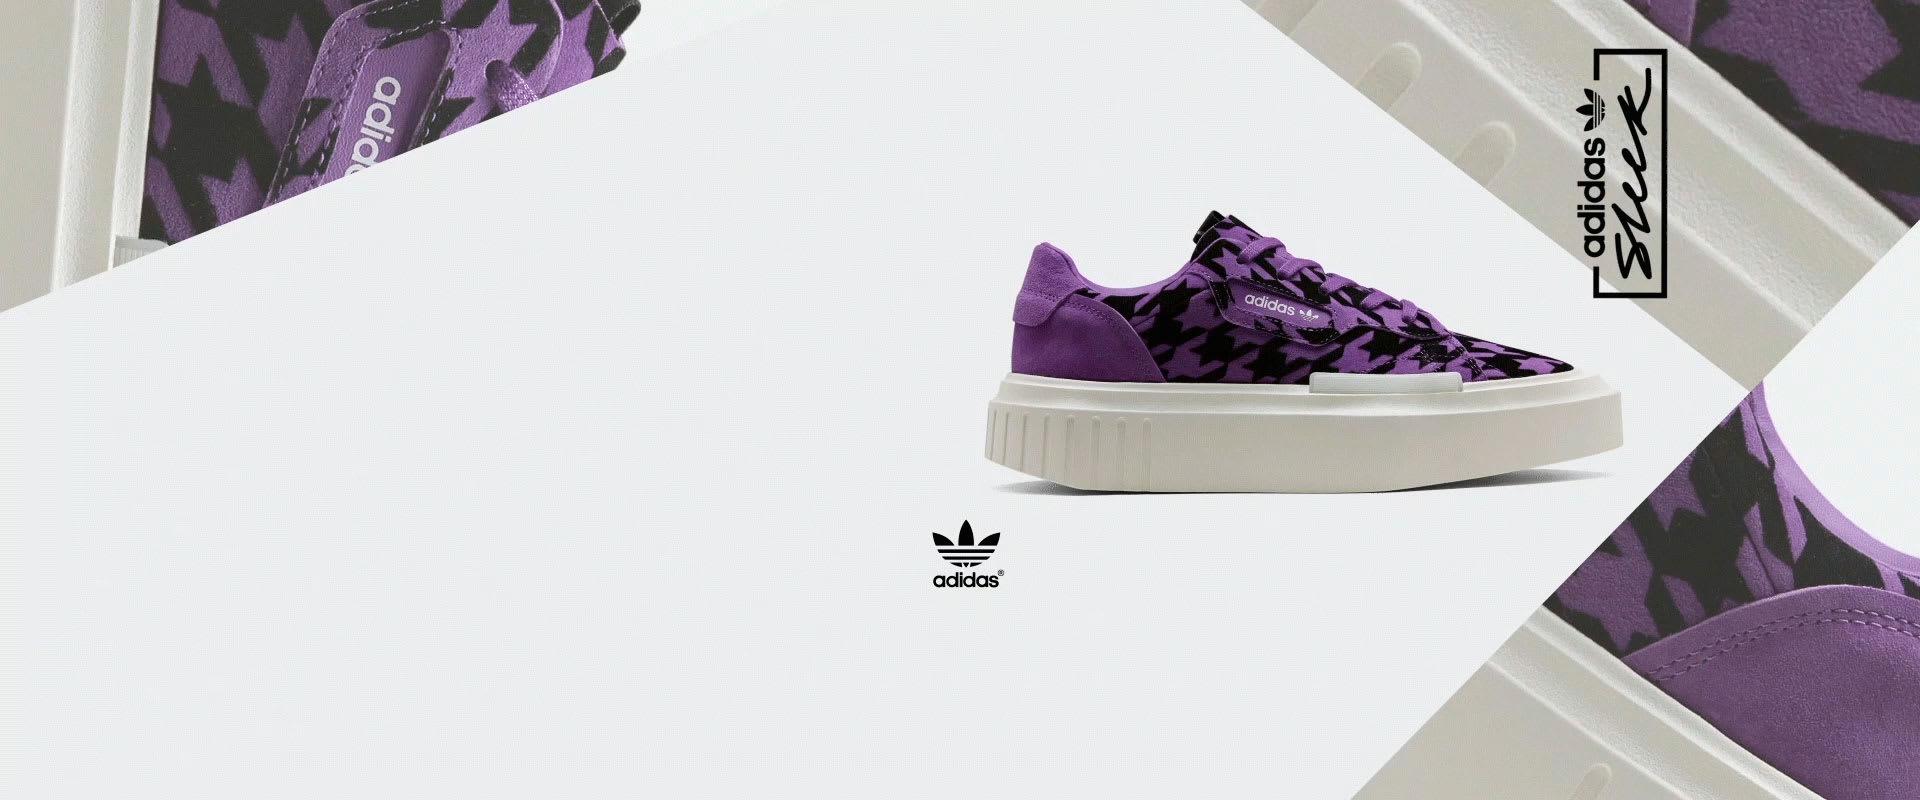 5f2e6f2d469b adidas officiel hjemmeside